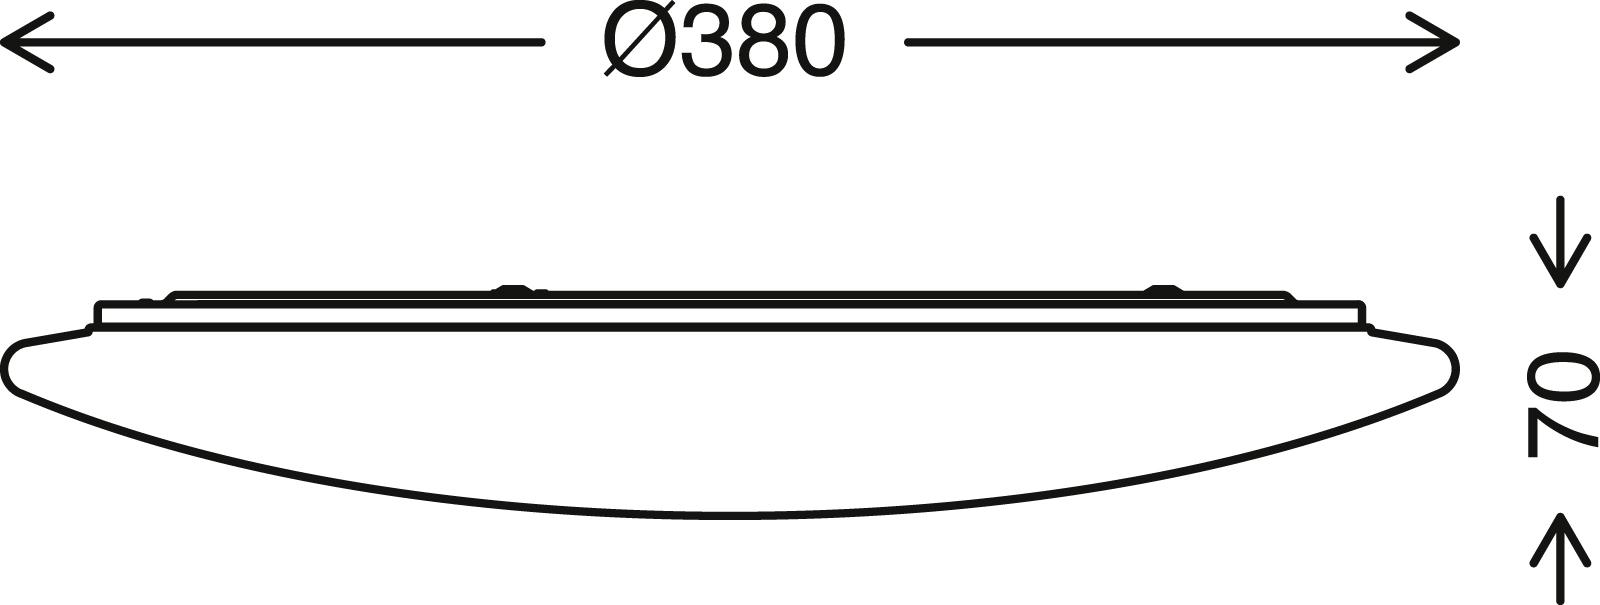 TELEFUNKEN Sensor LED Deckenleuchte, Ø 37,7 cm, 24 W, Weiss